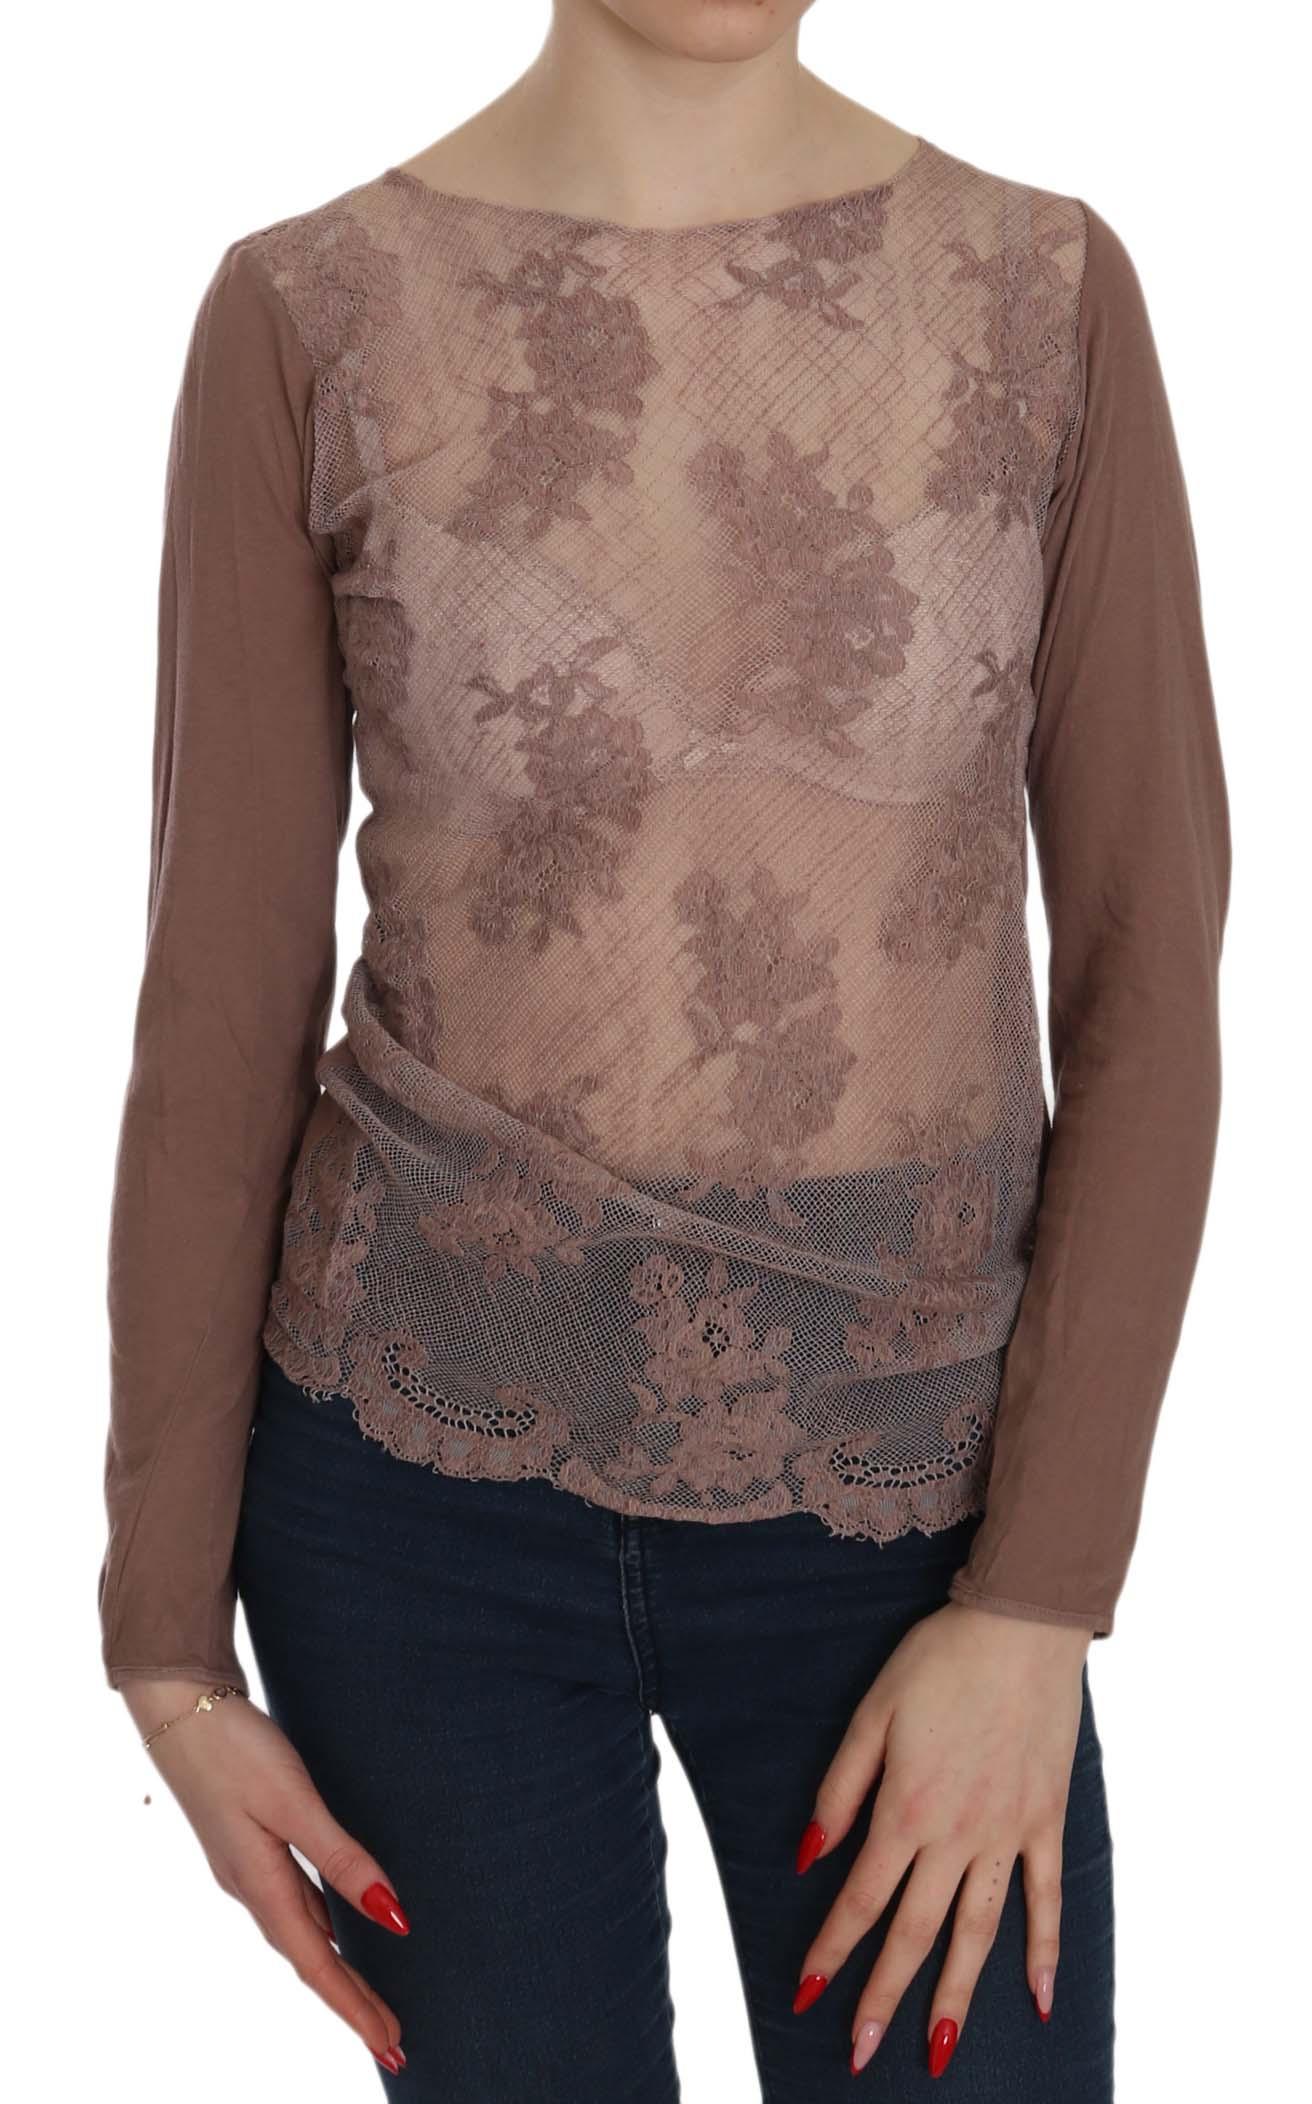 PINK MEMORIES Women's Lace See Through LS Top Brown TSH3912 - IT42|M